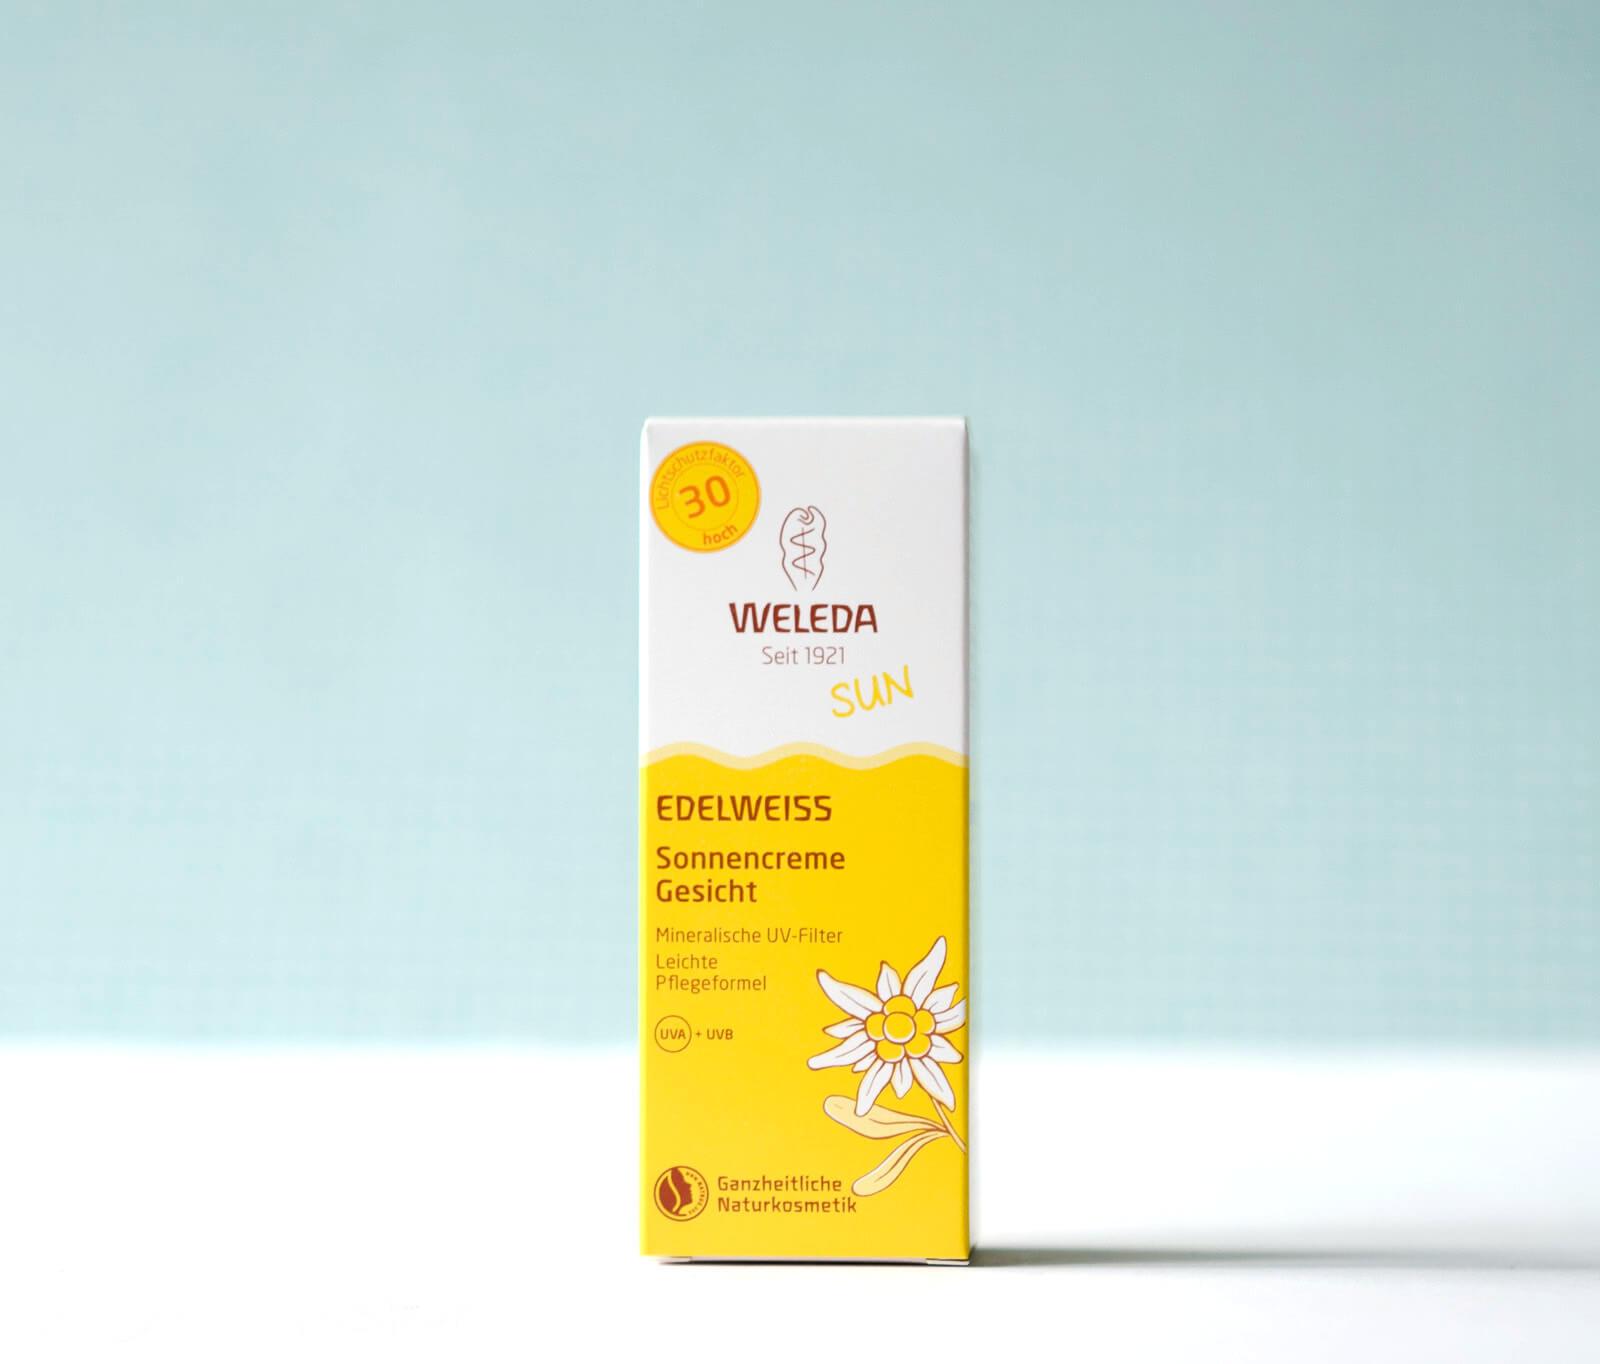 Weleda - Edelweiss Sonnencreme Gesicht LSF 30